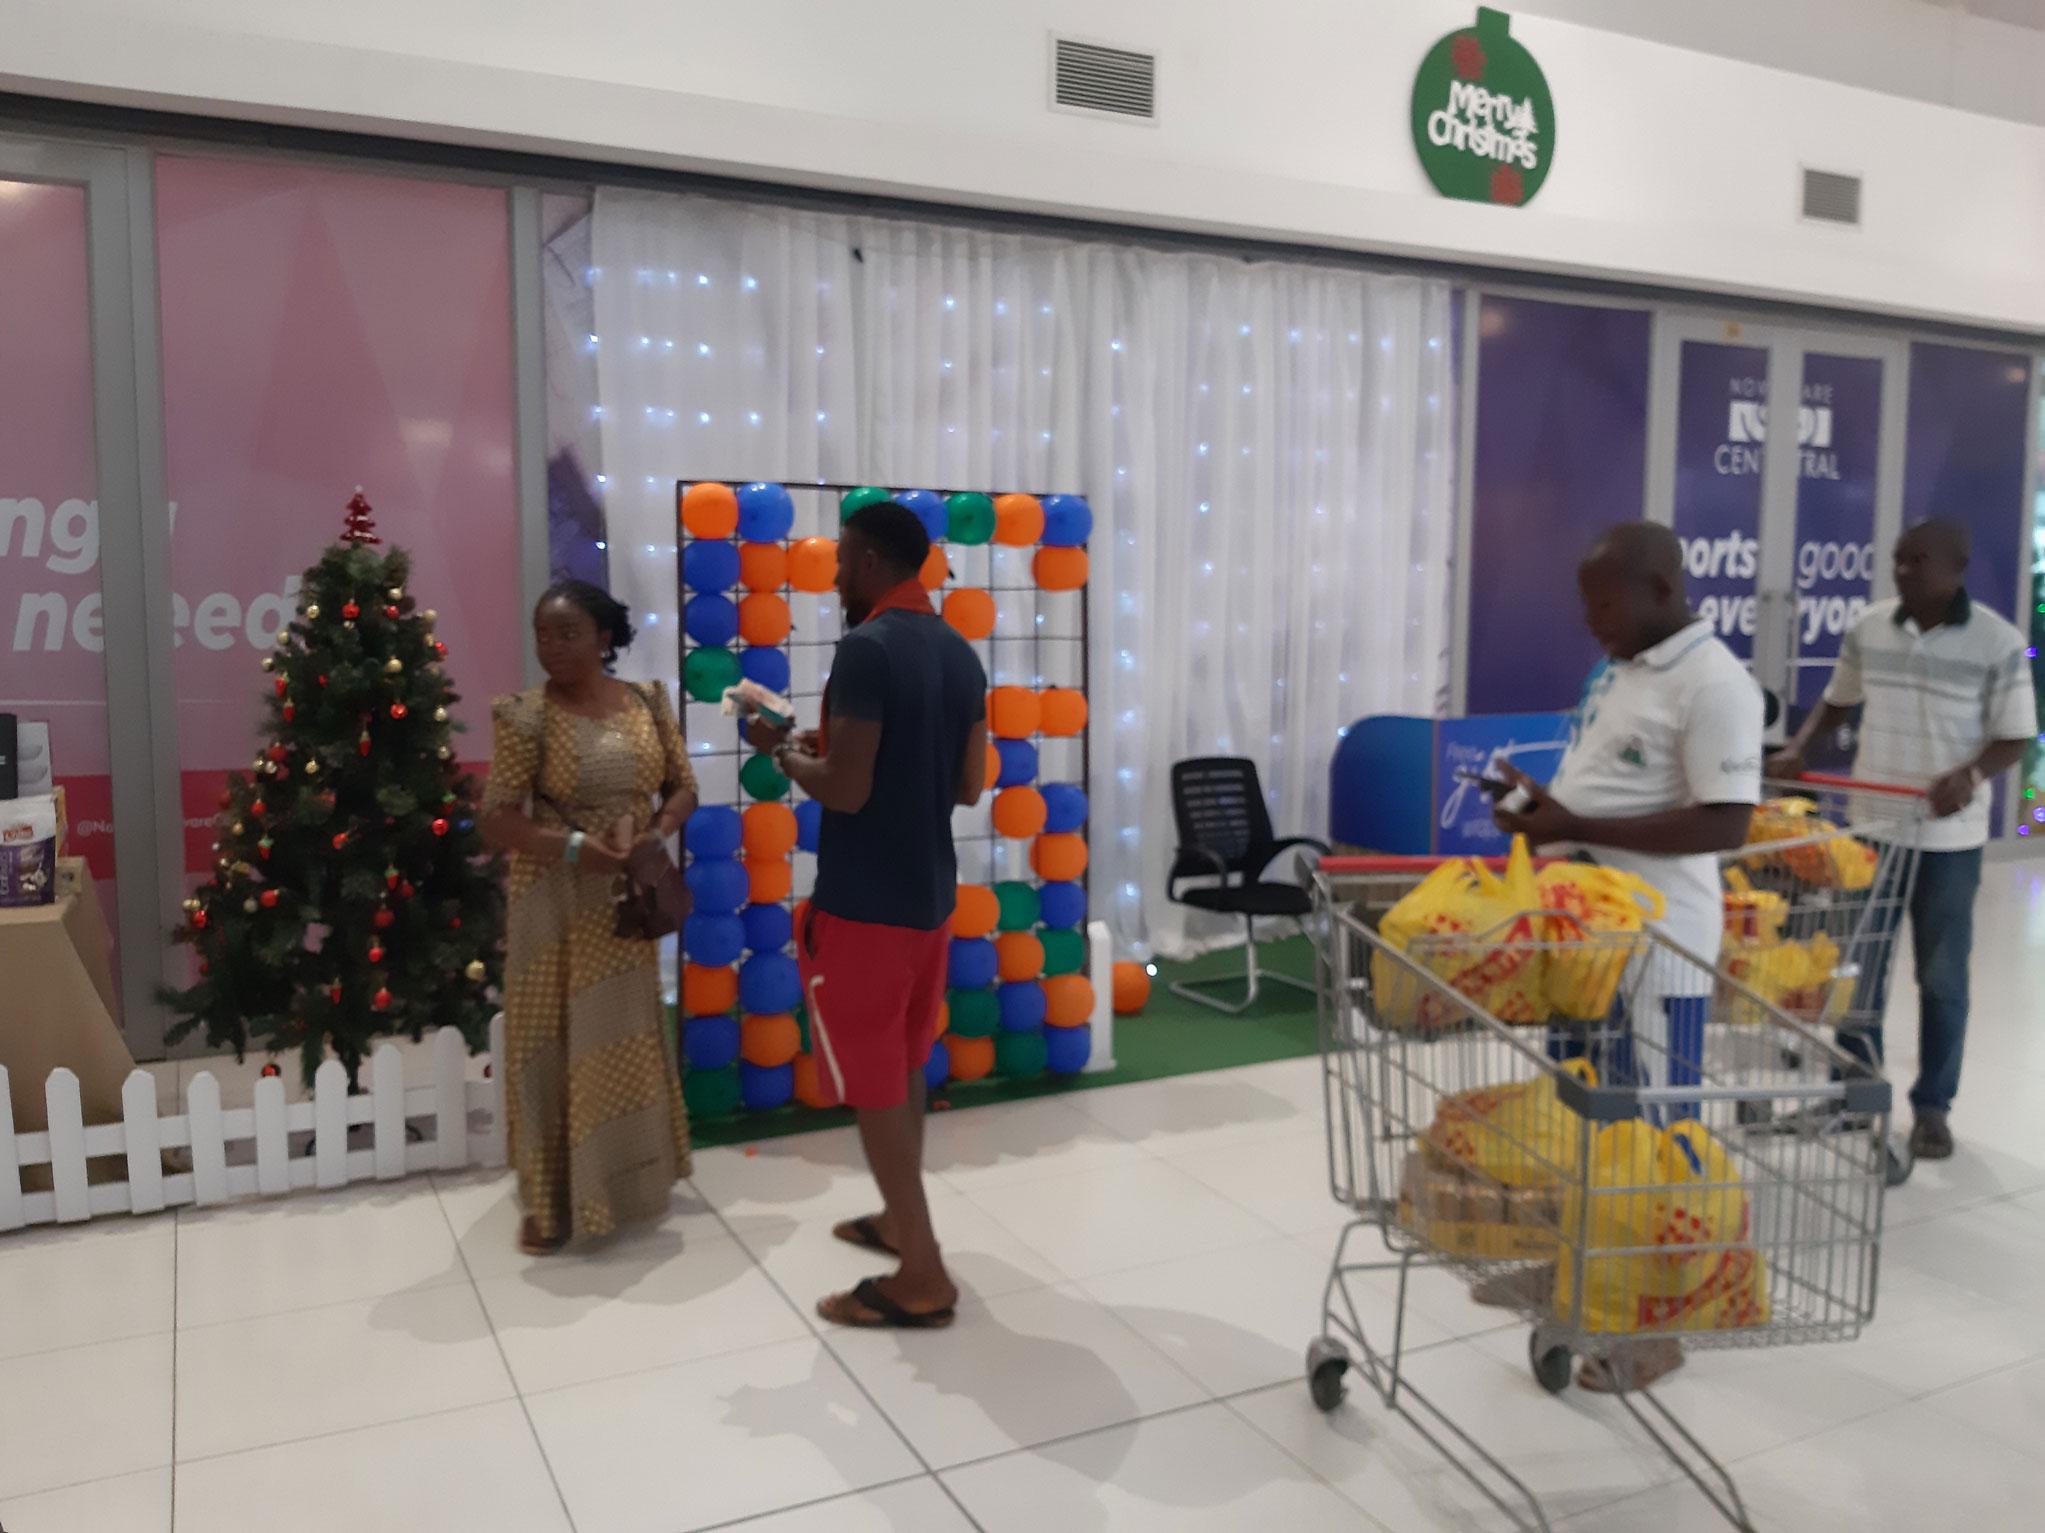 Shop, Pop & Win